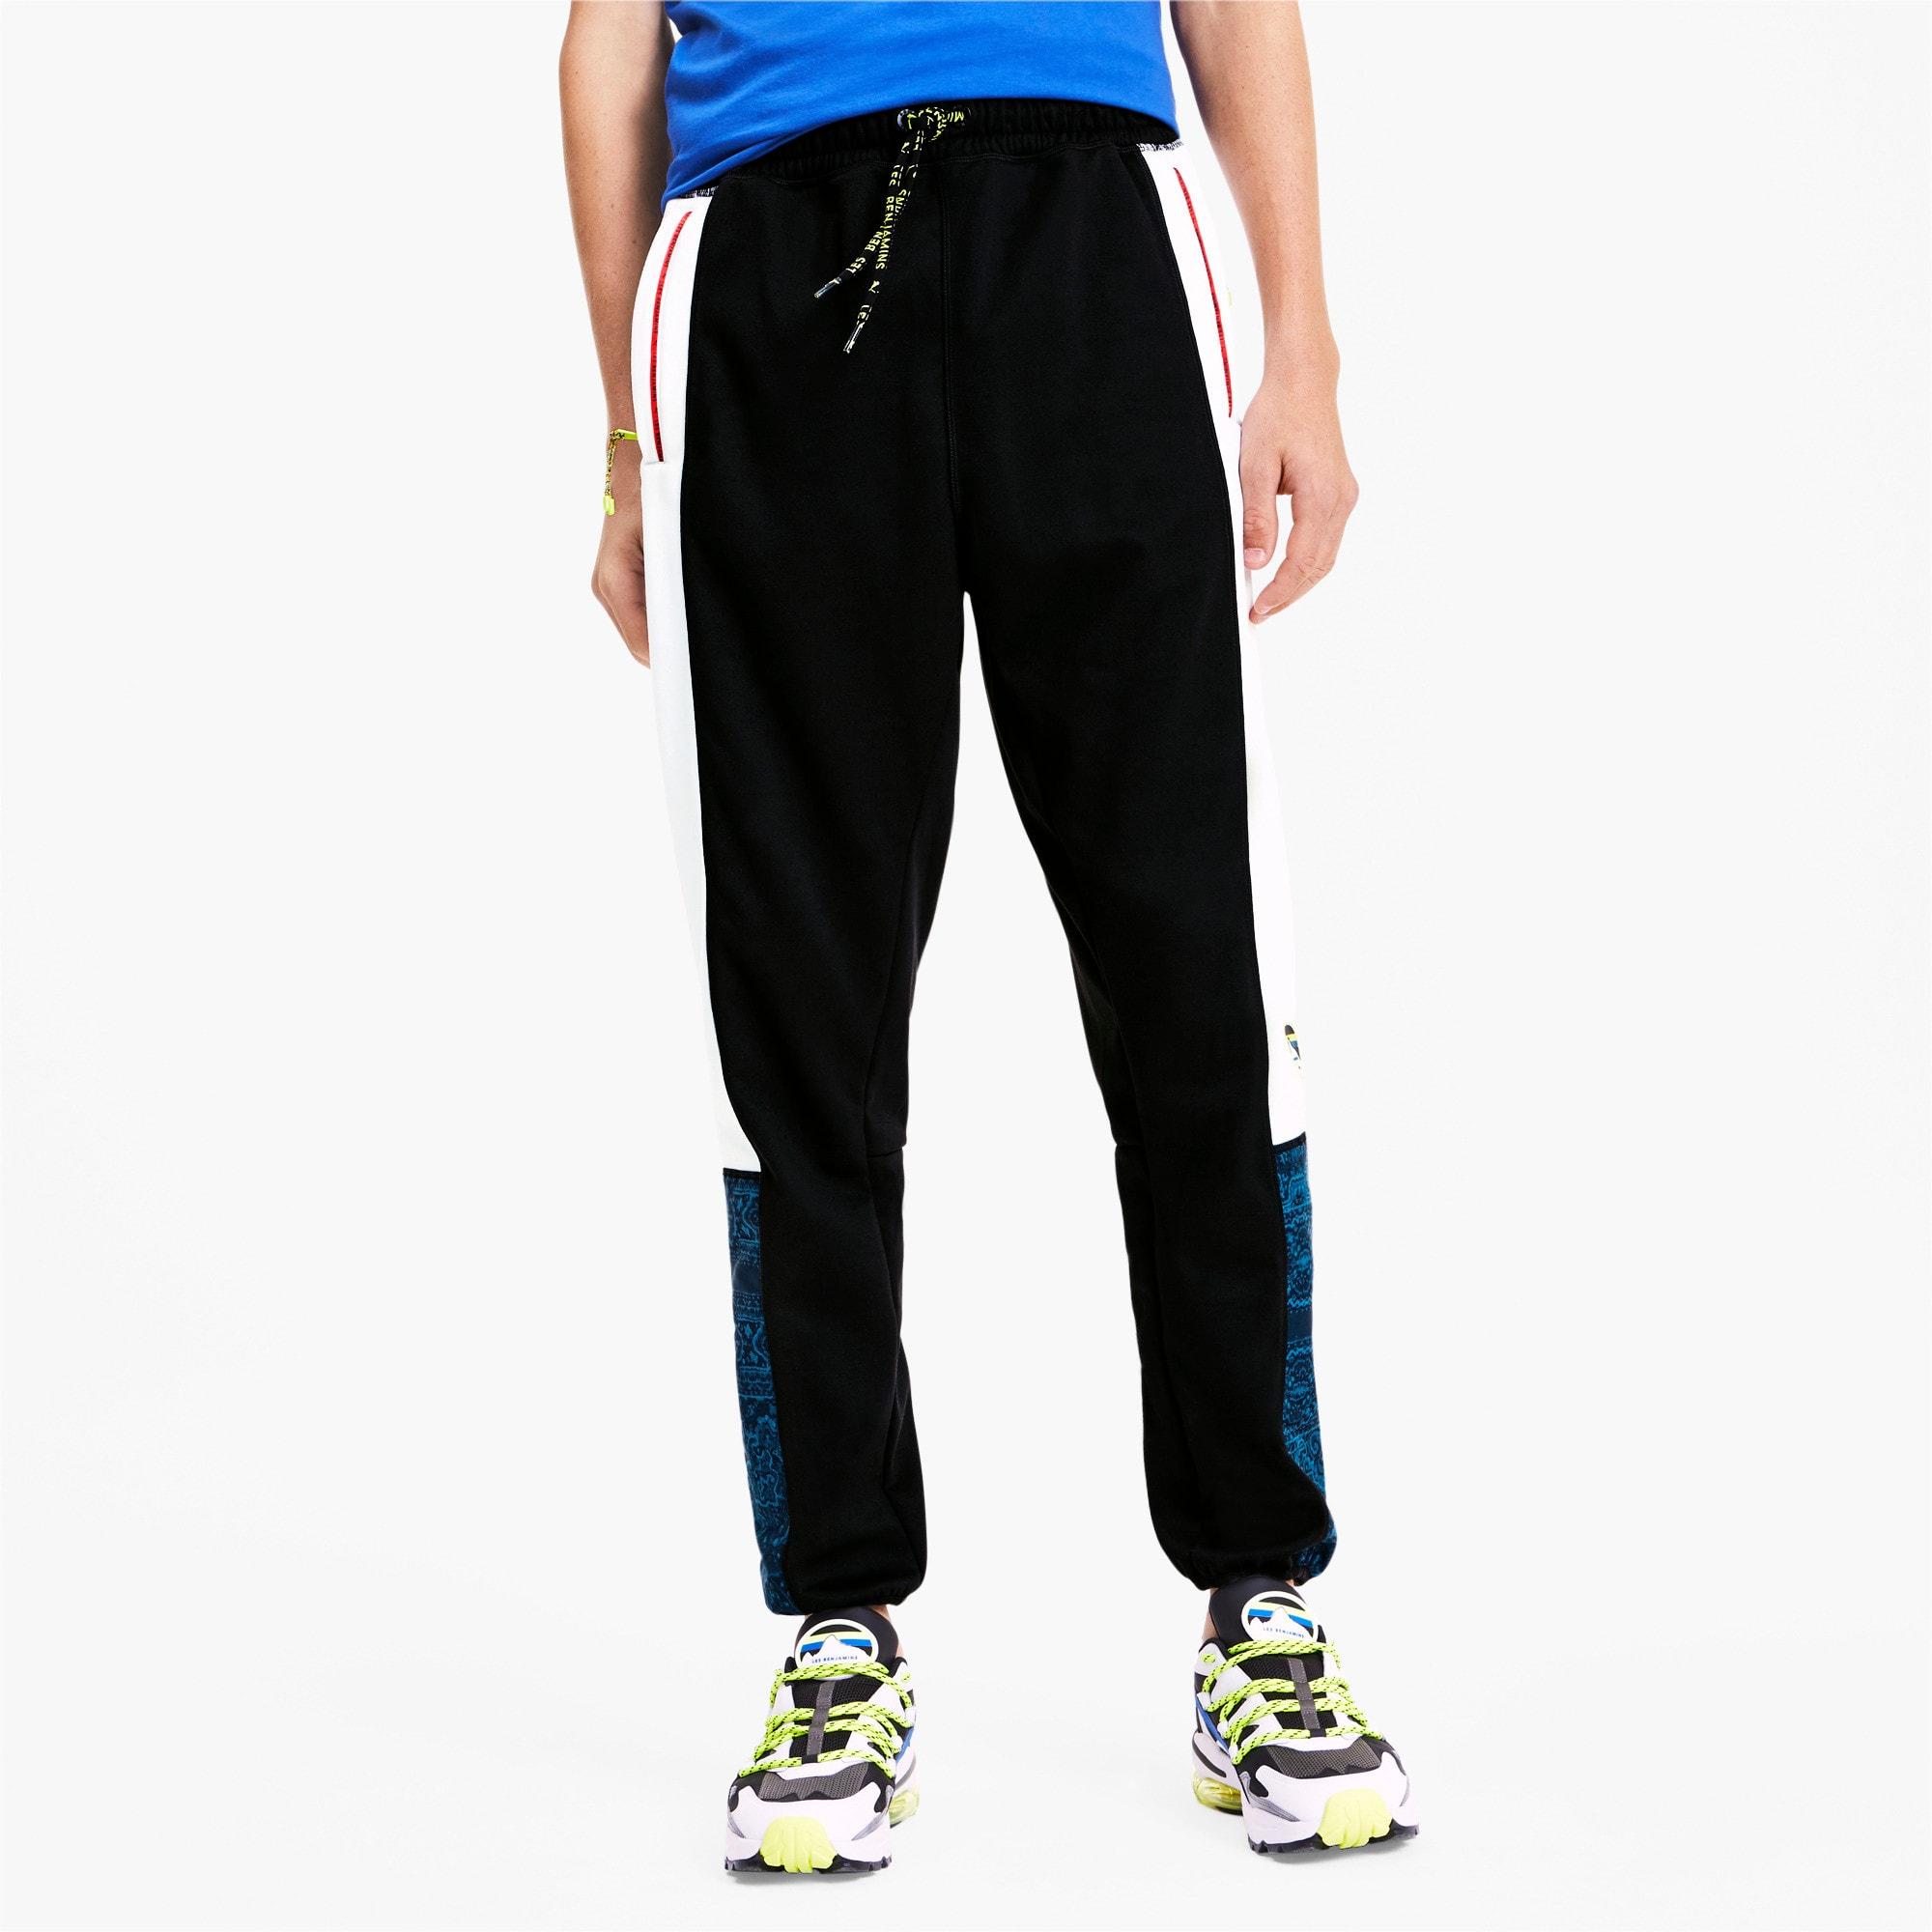 Miniatura 1 de Pantalones deportivos PUMA x LES BENJAMINS para hombre, Puma White, mediano